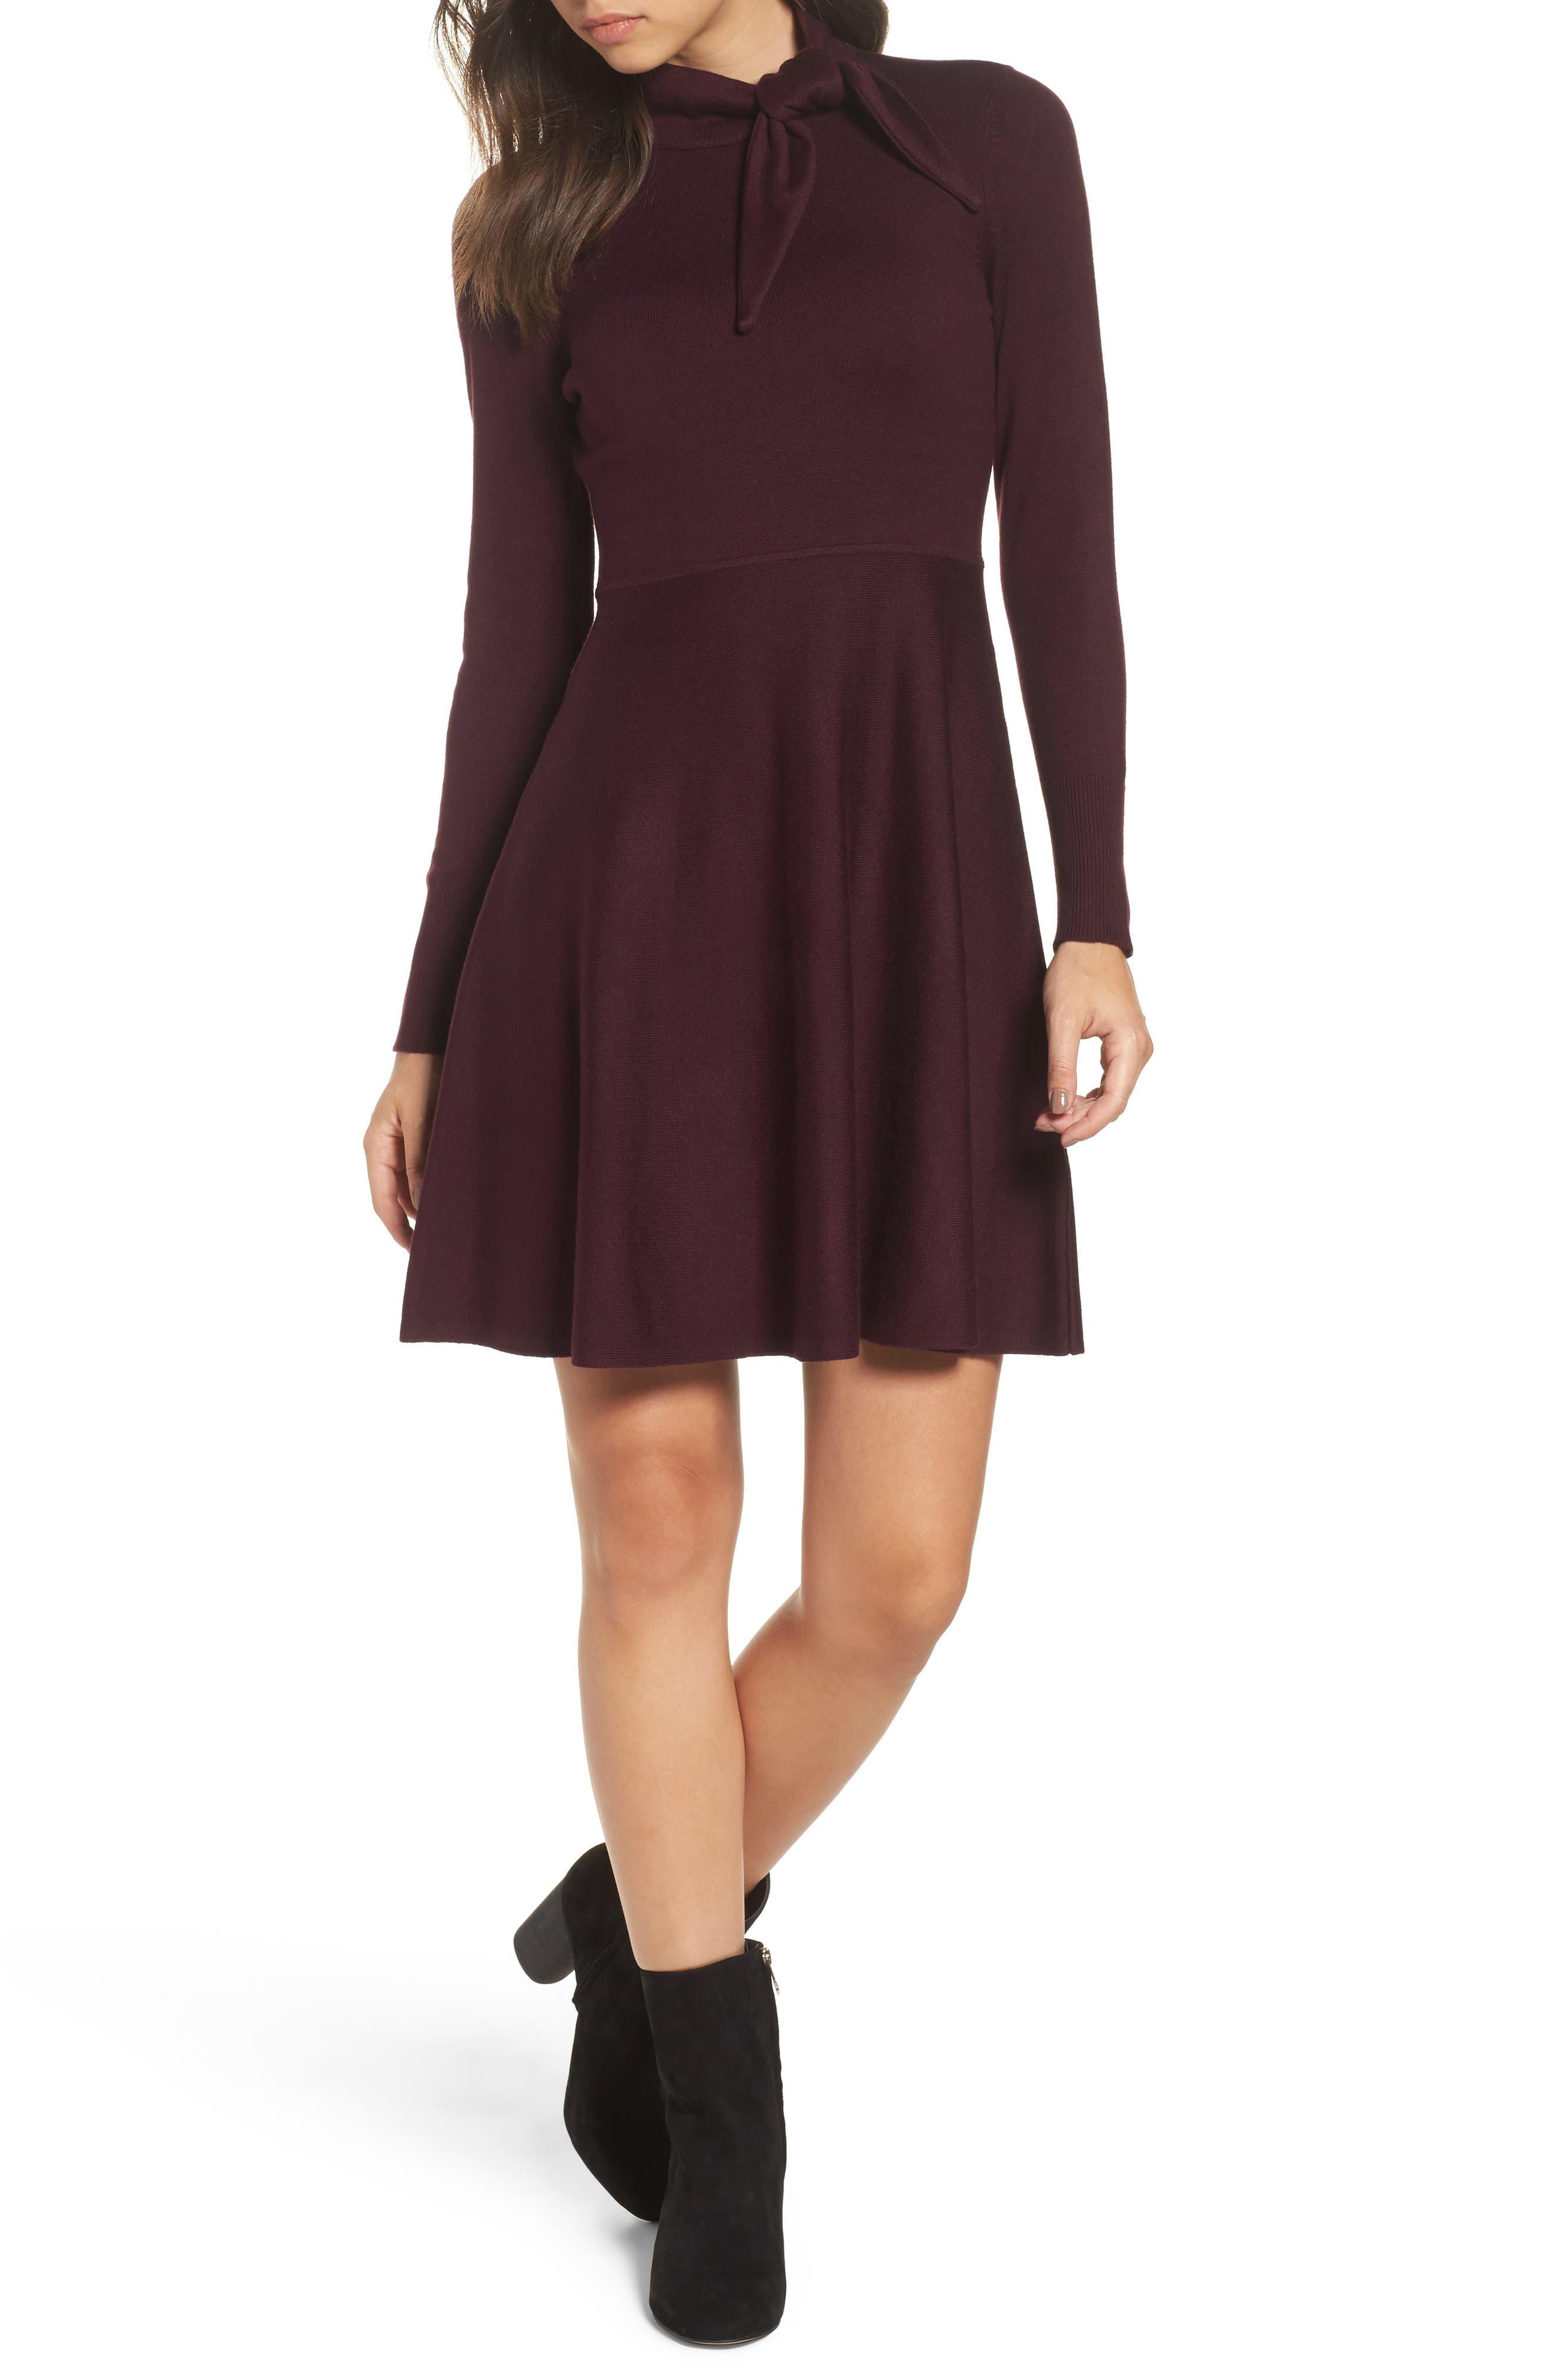 Alternate Image 1 Selected - Eliza J Tie Neck Fit & Flare Dress (Regular & Petite)